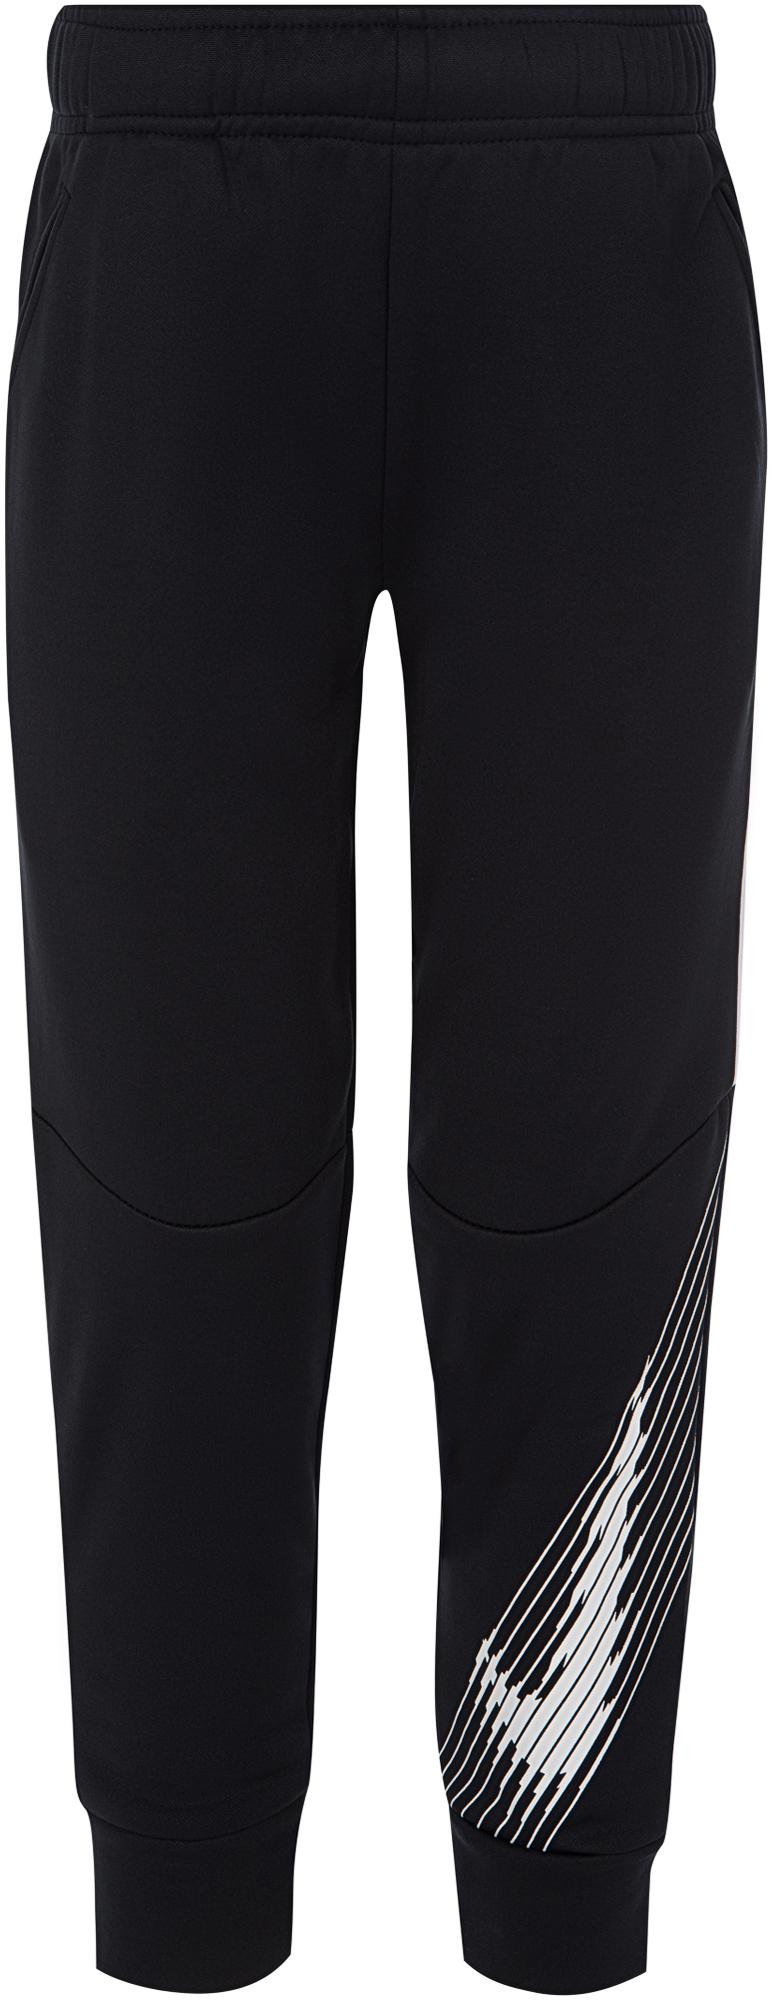 Nike Брюки для мальчиков Therma, размер 122